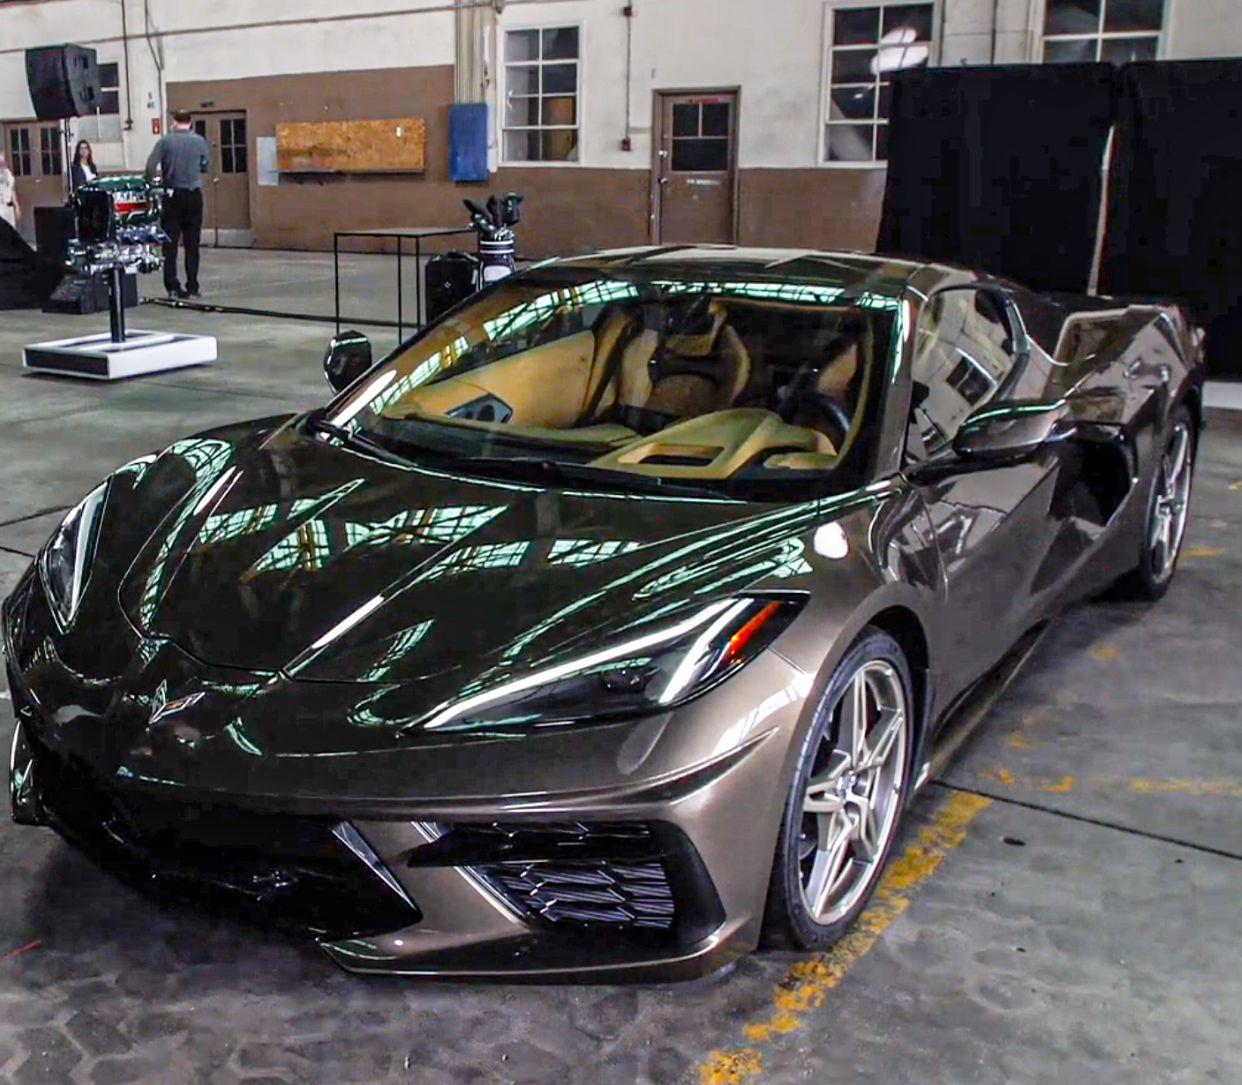 2020 Corvette Stingray 495HP 0-60 Under 3 Seconds $65,000